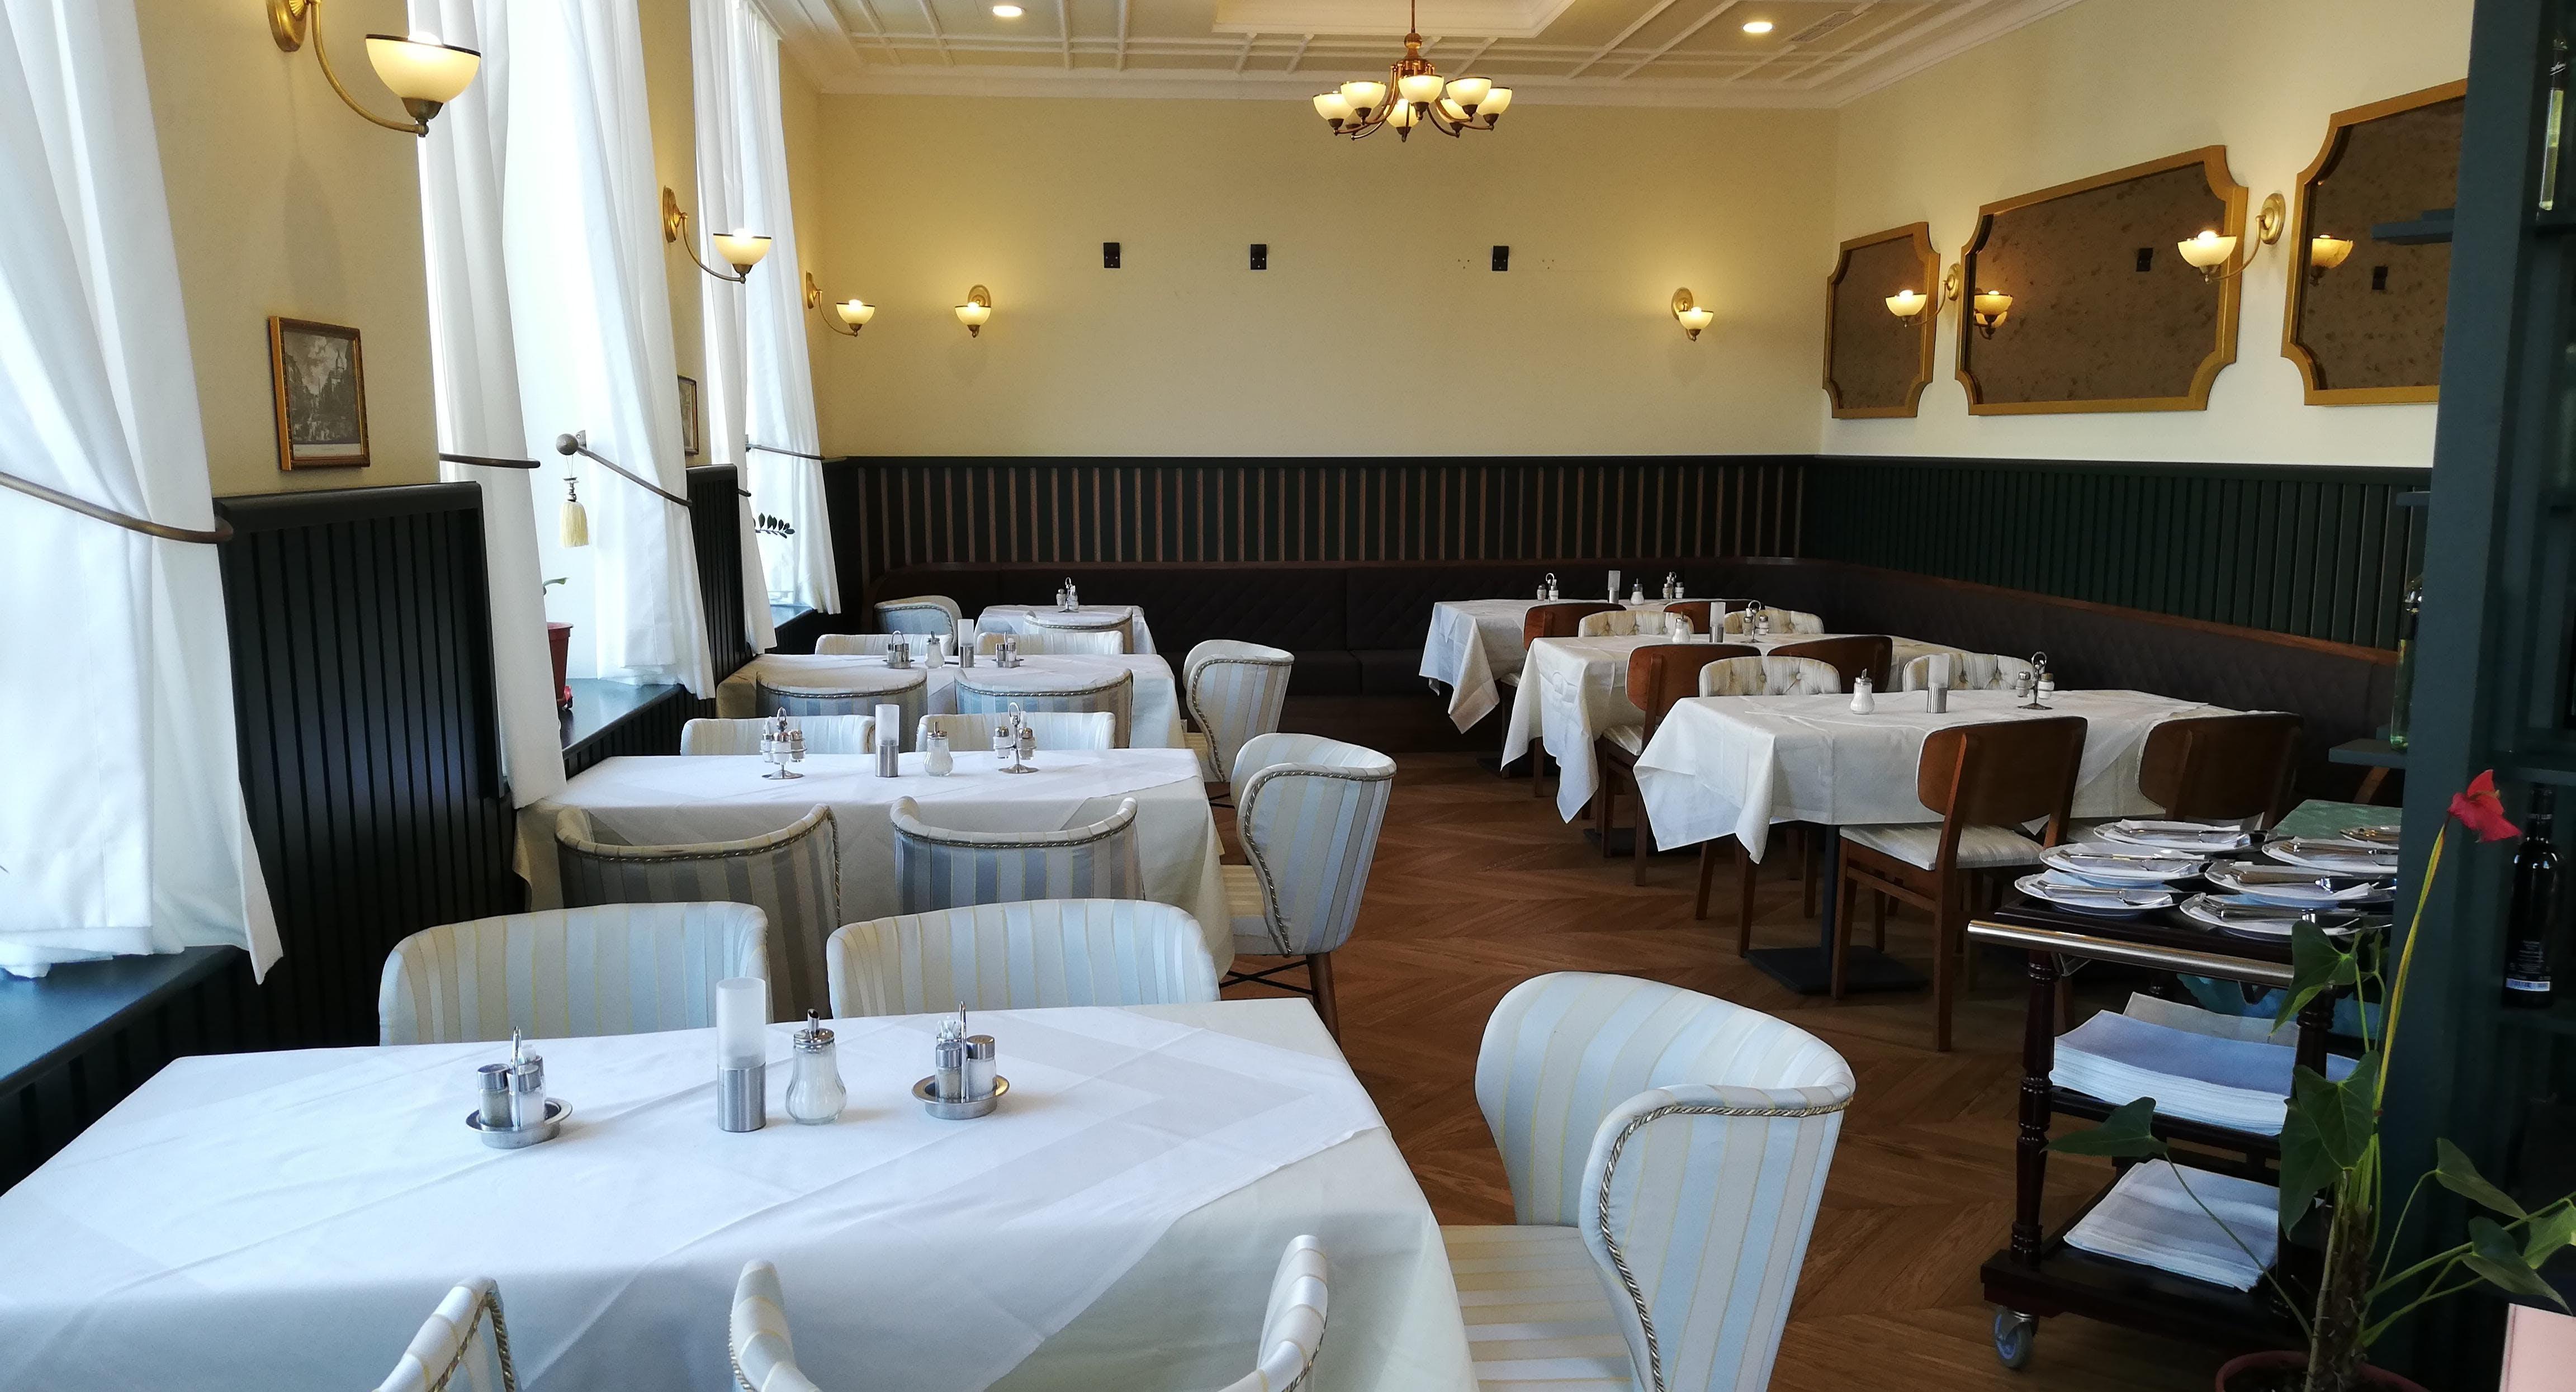 Restaurant Tafelspitz